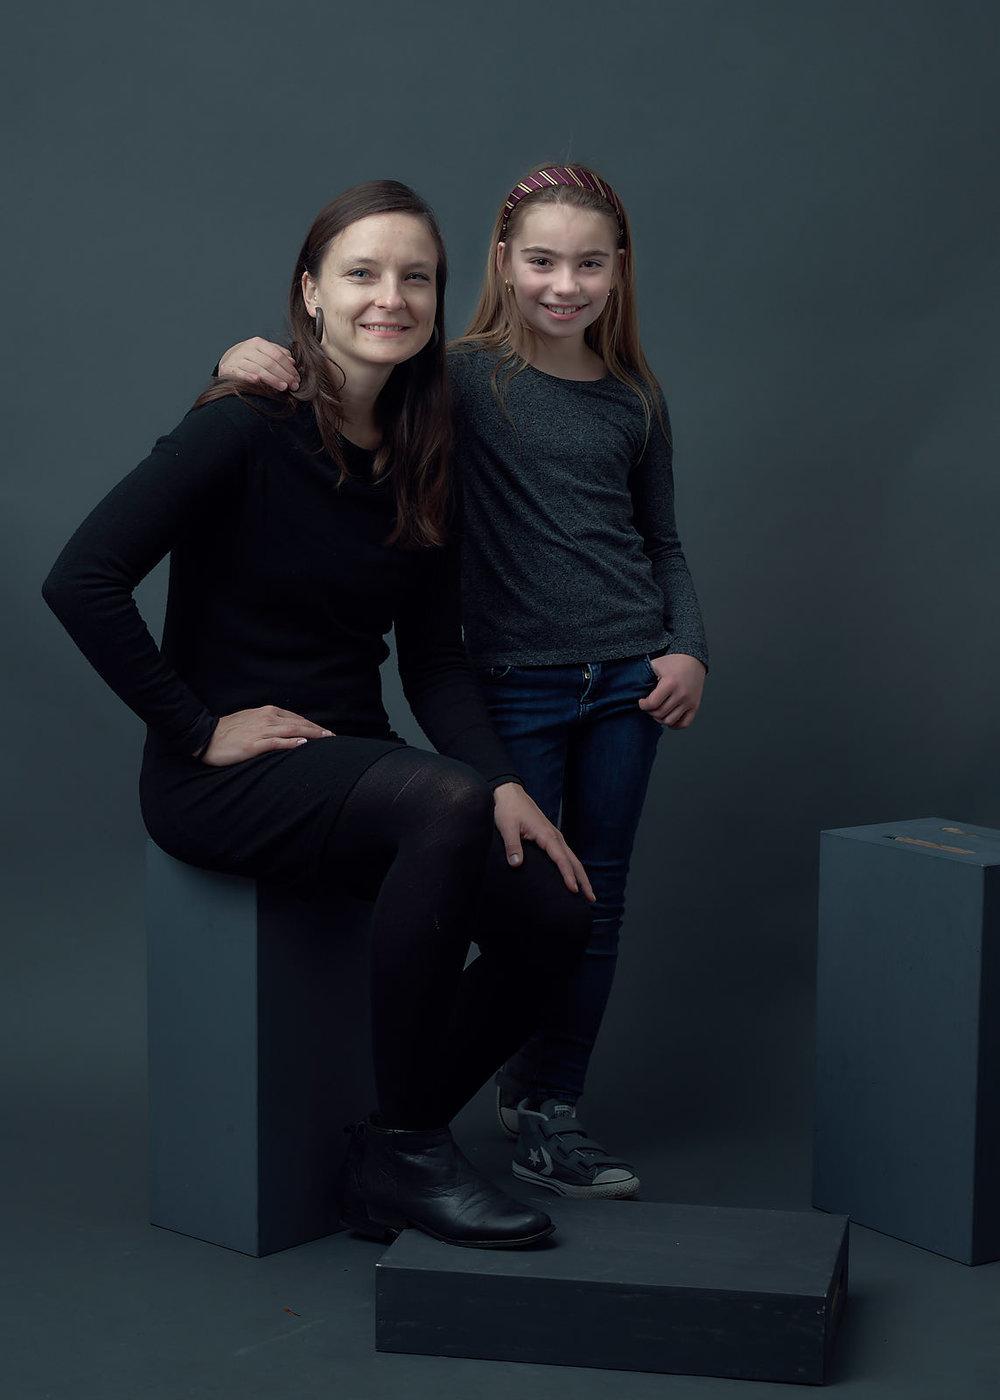 Family-Children-Portrait-Photography-Geneva-Geneve-Patric-Pop-07.jpg